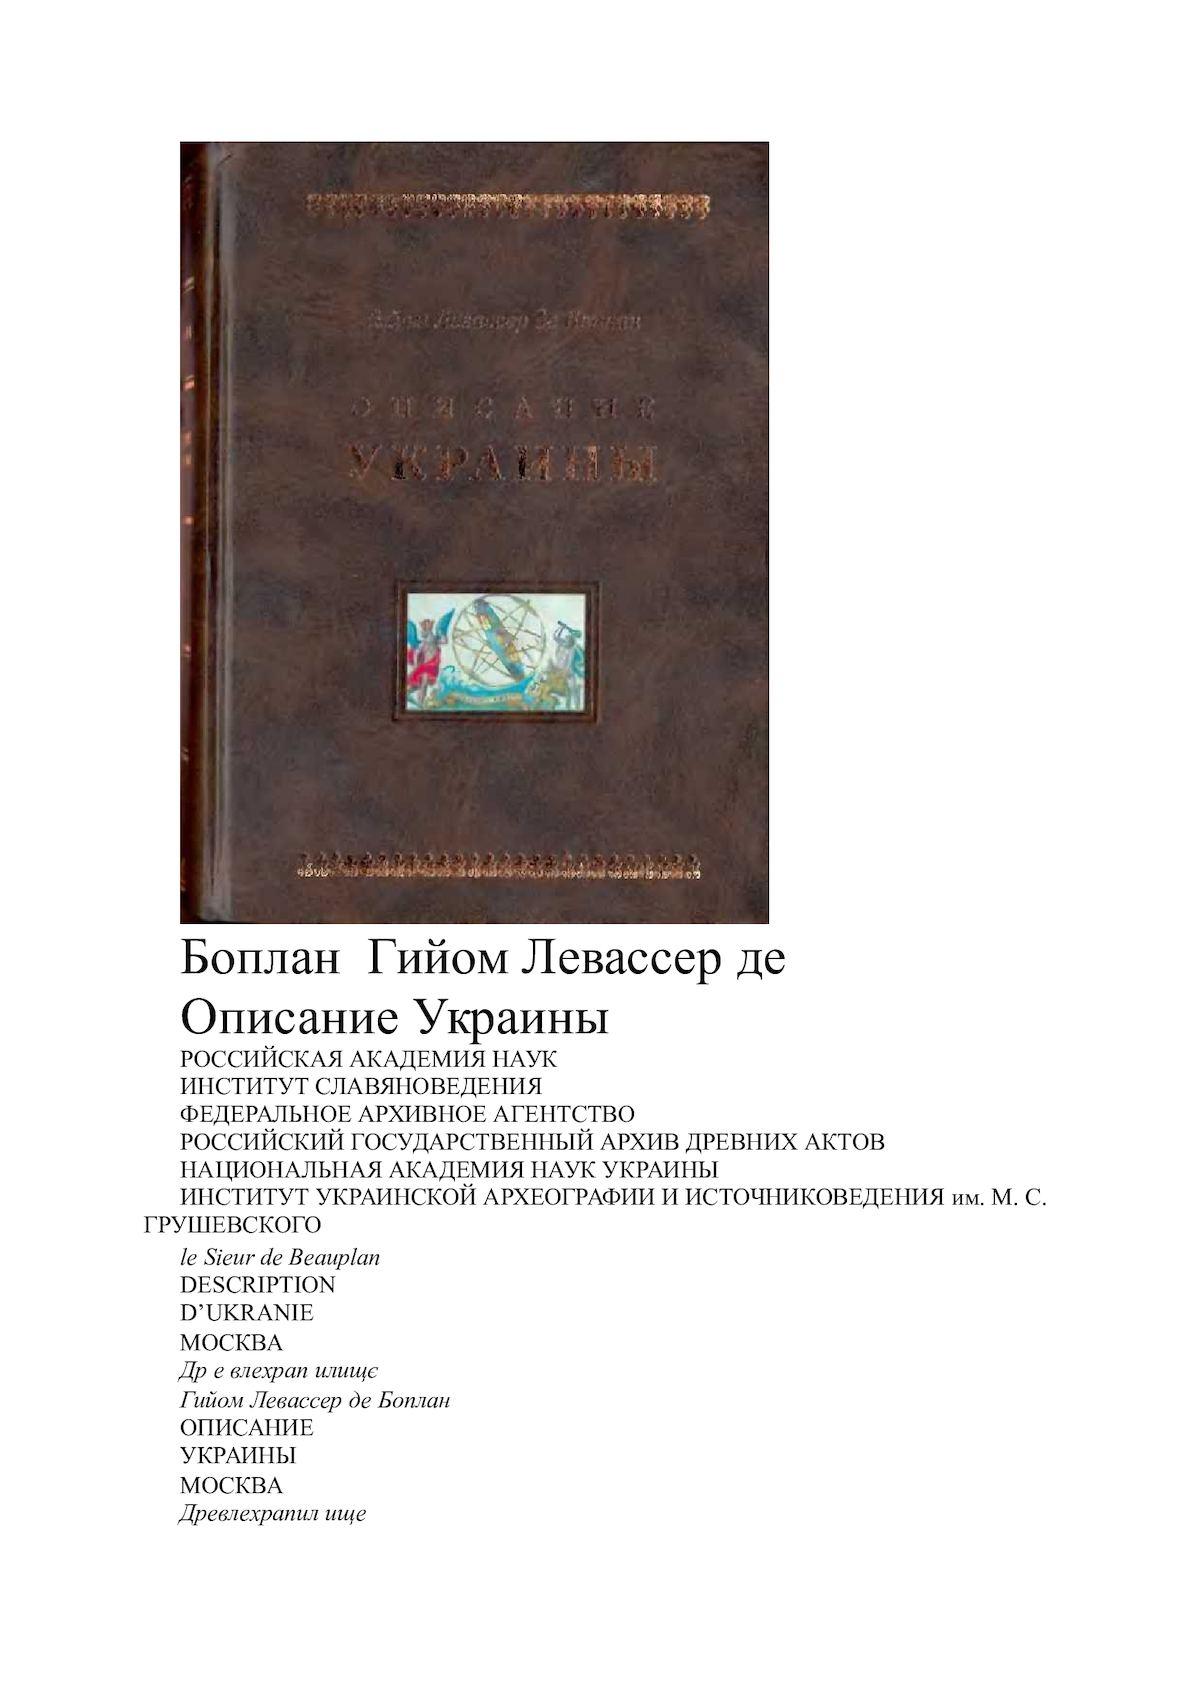 Calaméo - Giyom Levasserde Boplan Opisanie Ukrainy Ru Lit Me 428825 6acaa9b26ed